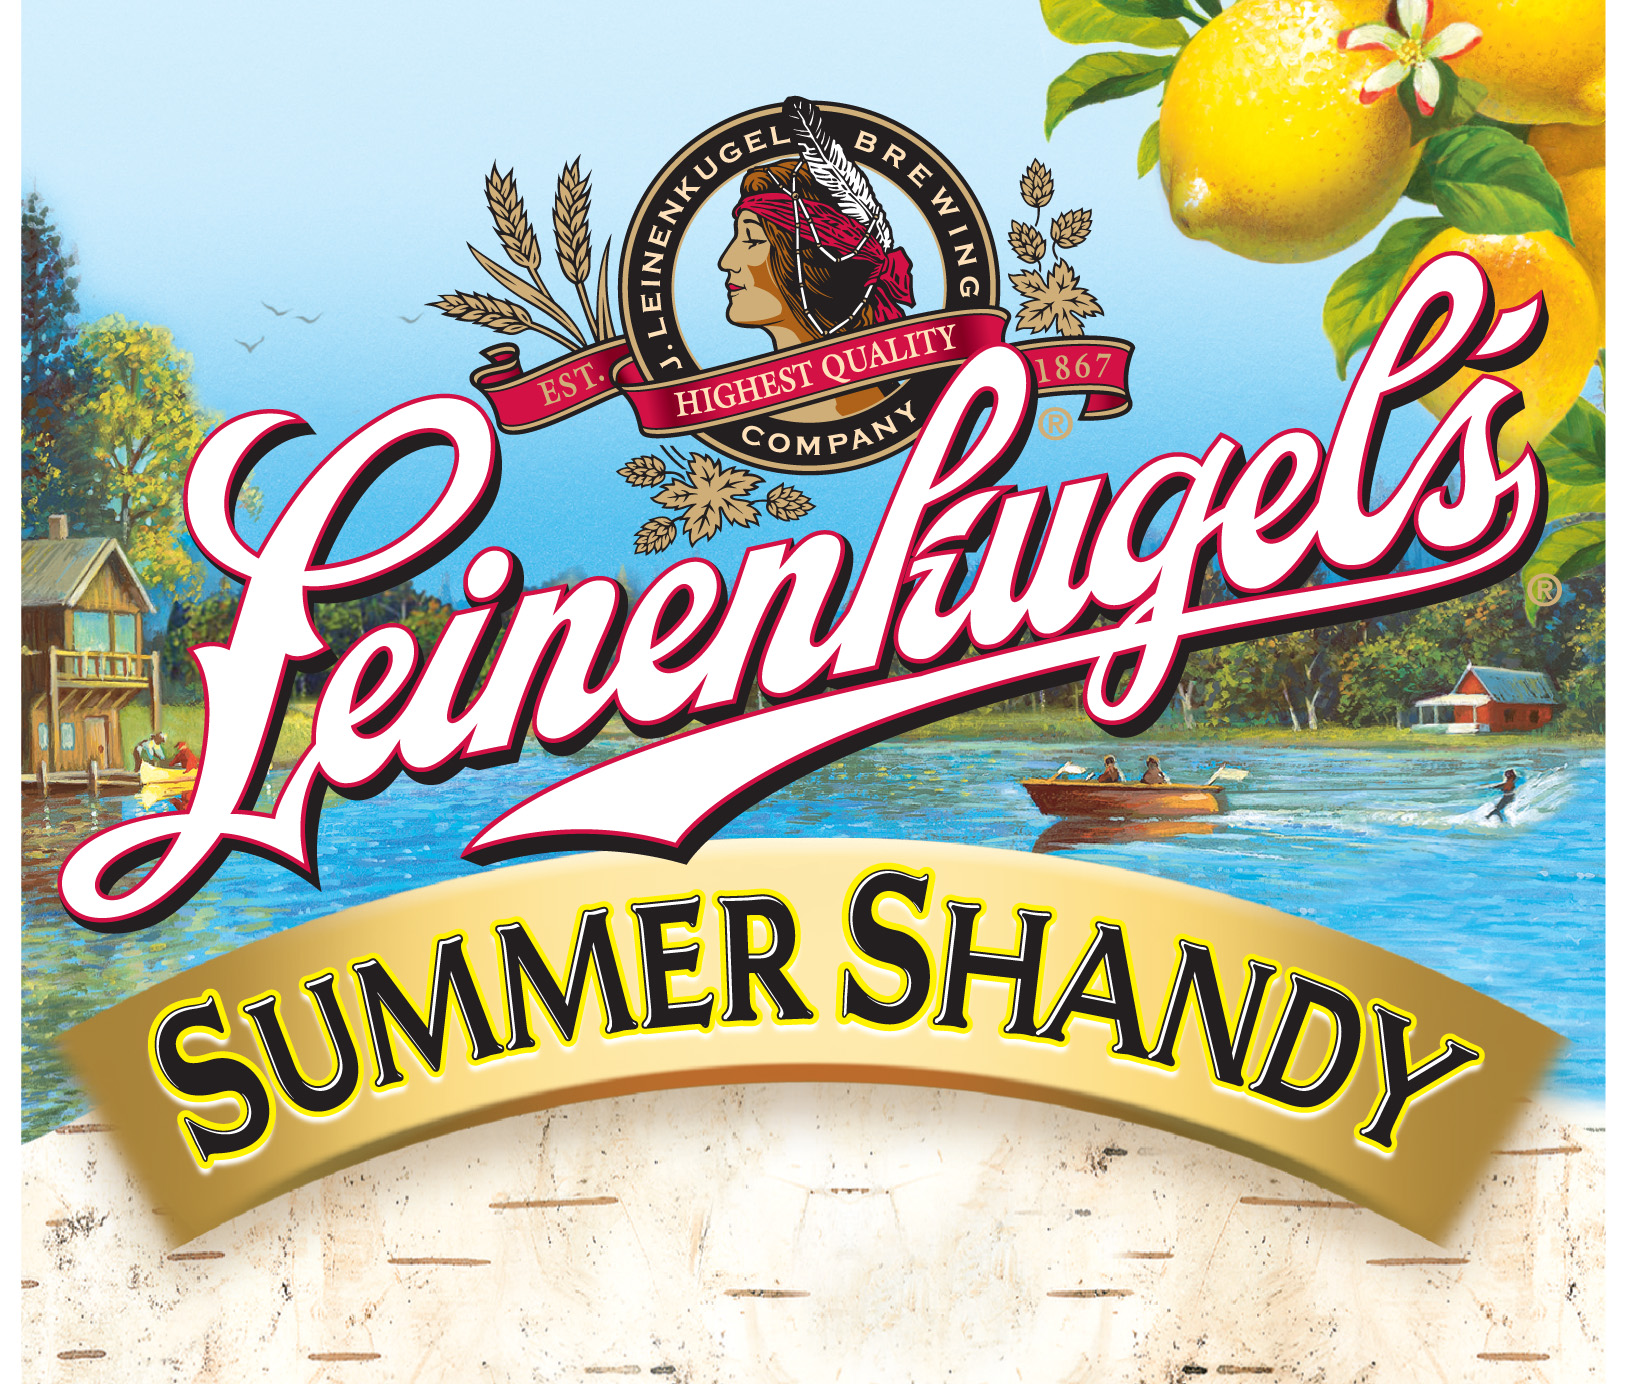 Where to buy leinenkugel s grapefruit shandy - Ranking The 2014 Shandy Beers